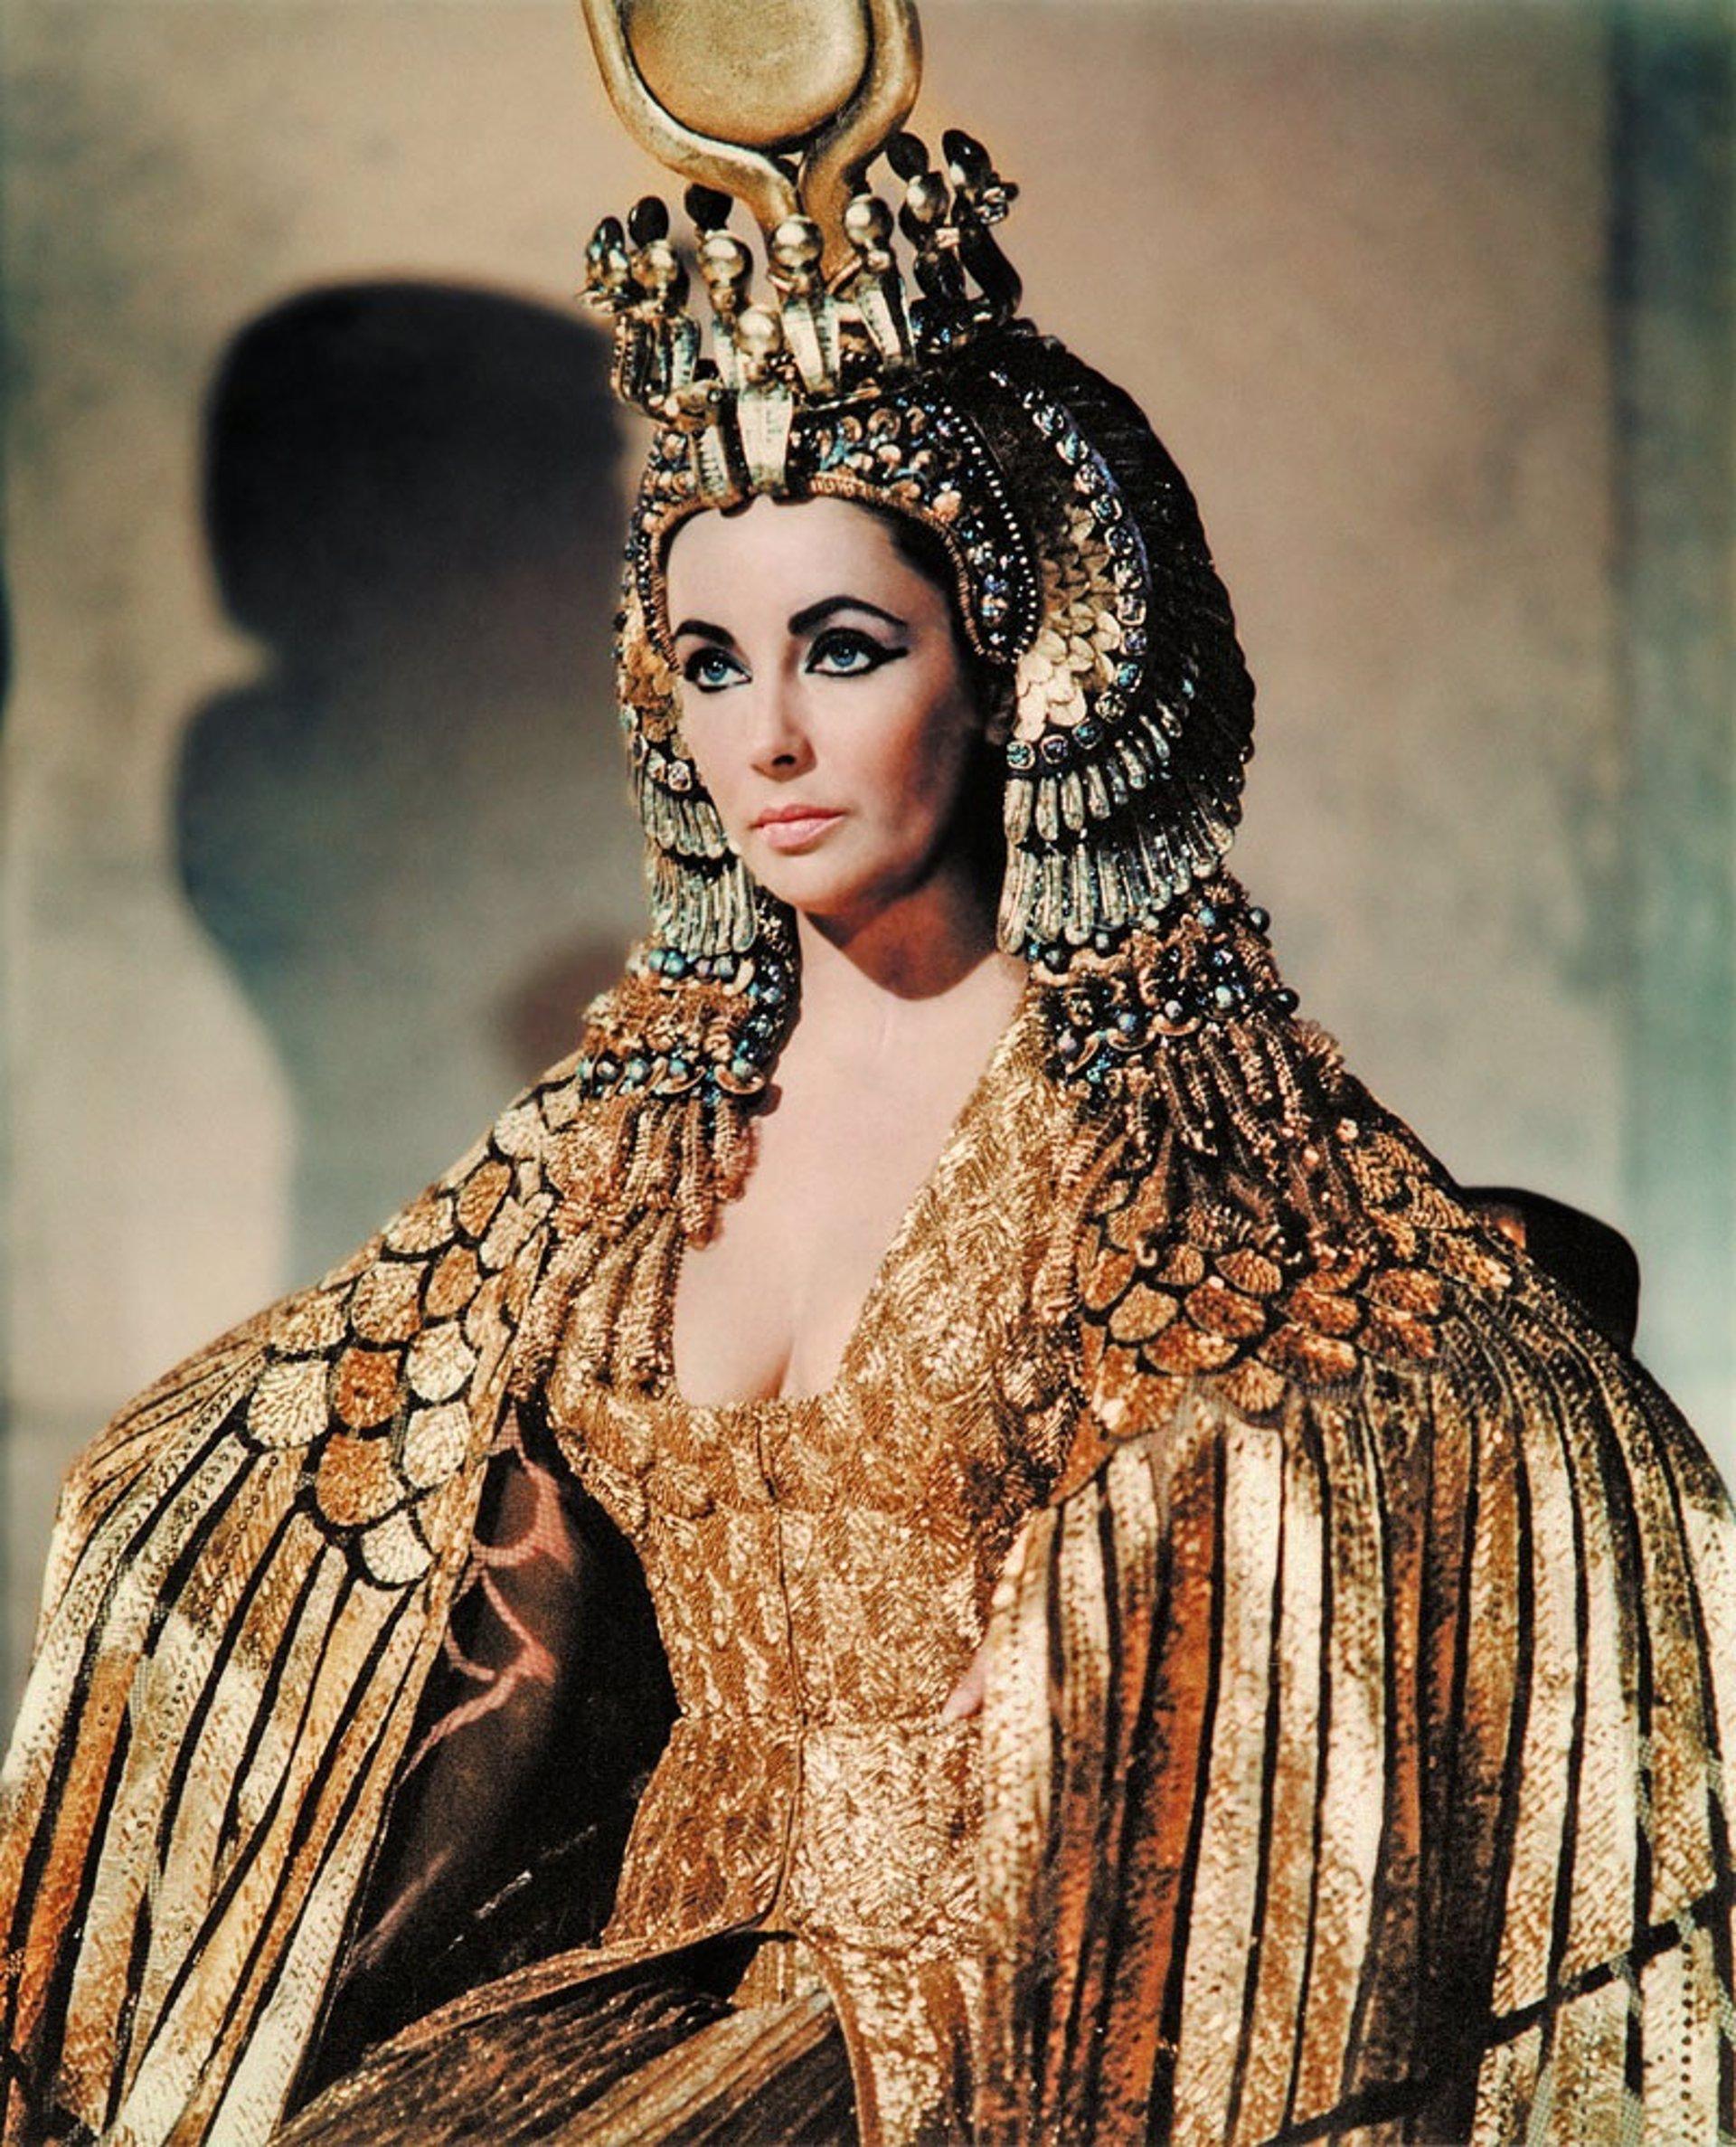 Subastan las joyas que lució Liz Taylor en Cleopatra